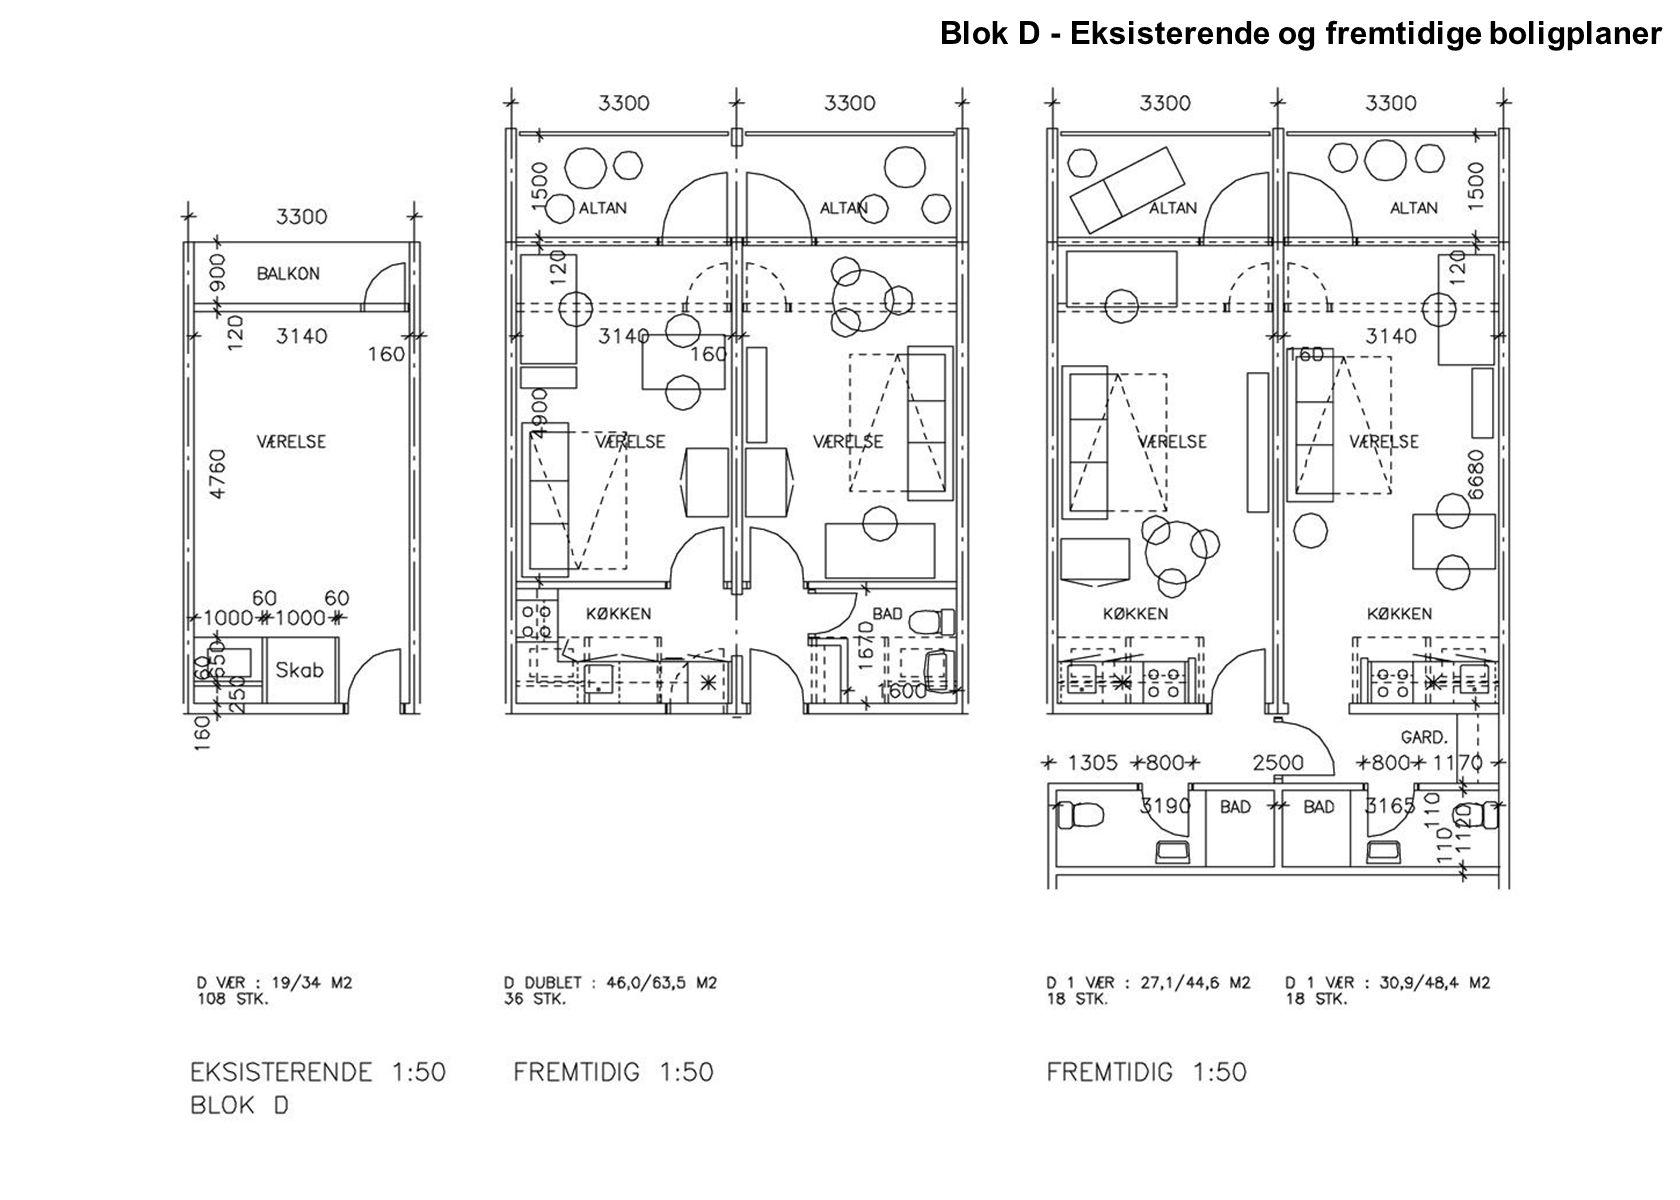 Blok D - Eksisterende og fremtidige boligplaner